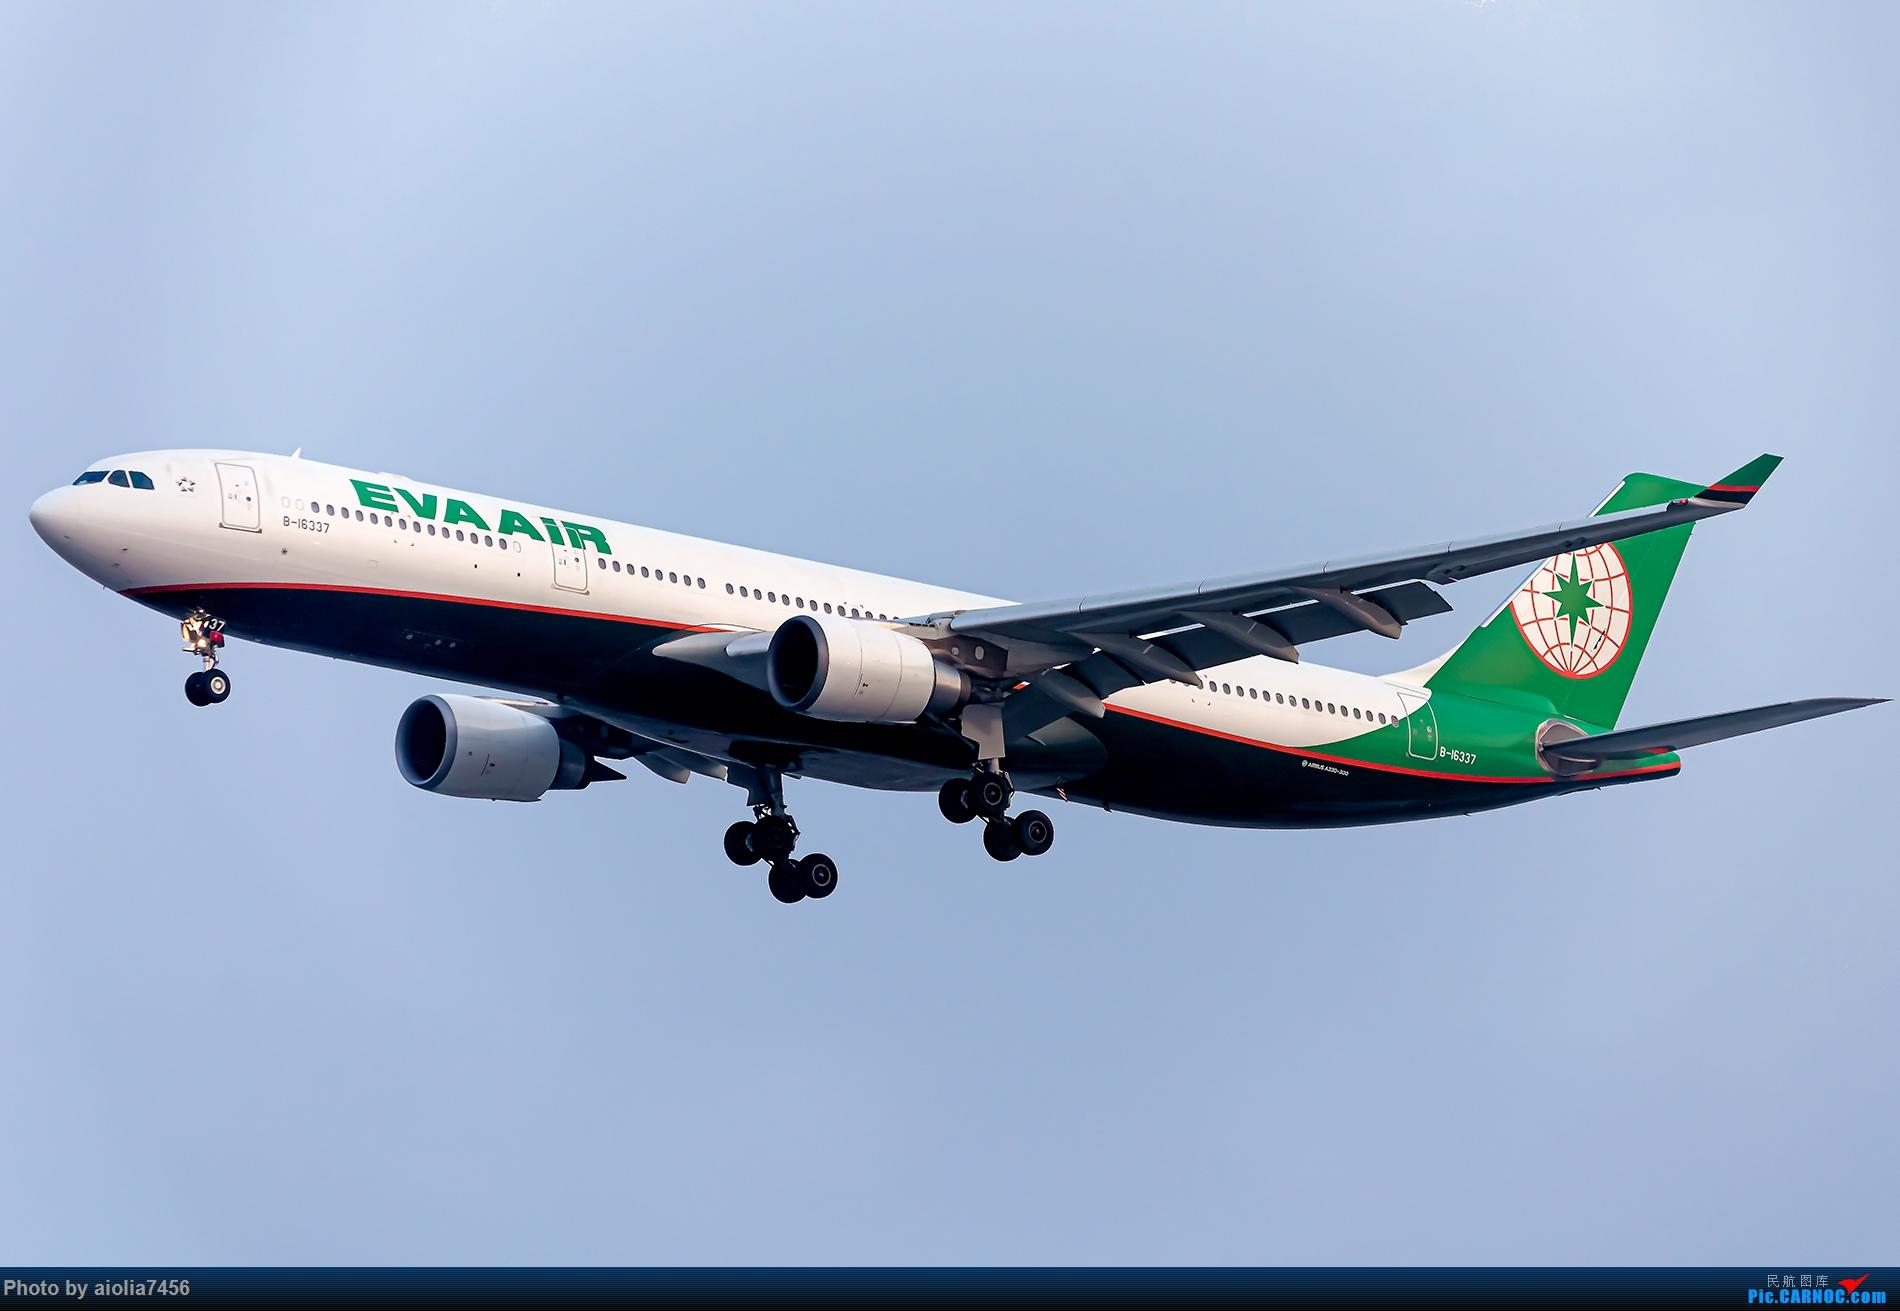 Re:[原创]【霸都打机队】上海培训时顺带虹桥扫货,结果遇到水泥天 AIRBUS A330-300 B-16337 中国上海虹桥国际机场